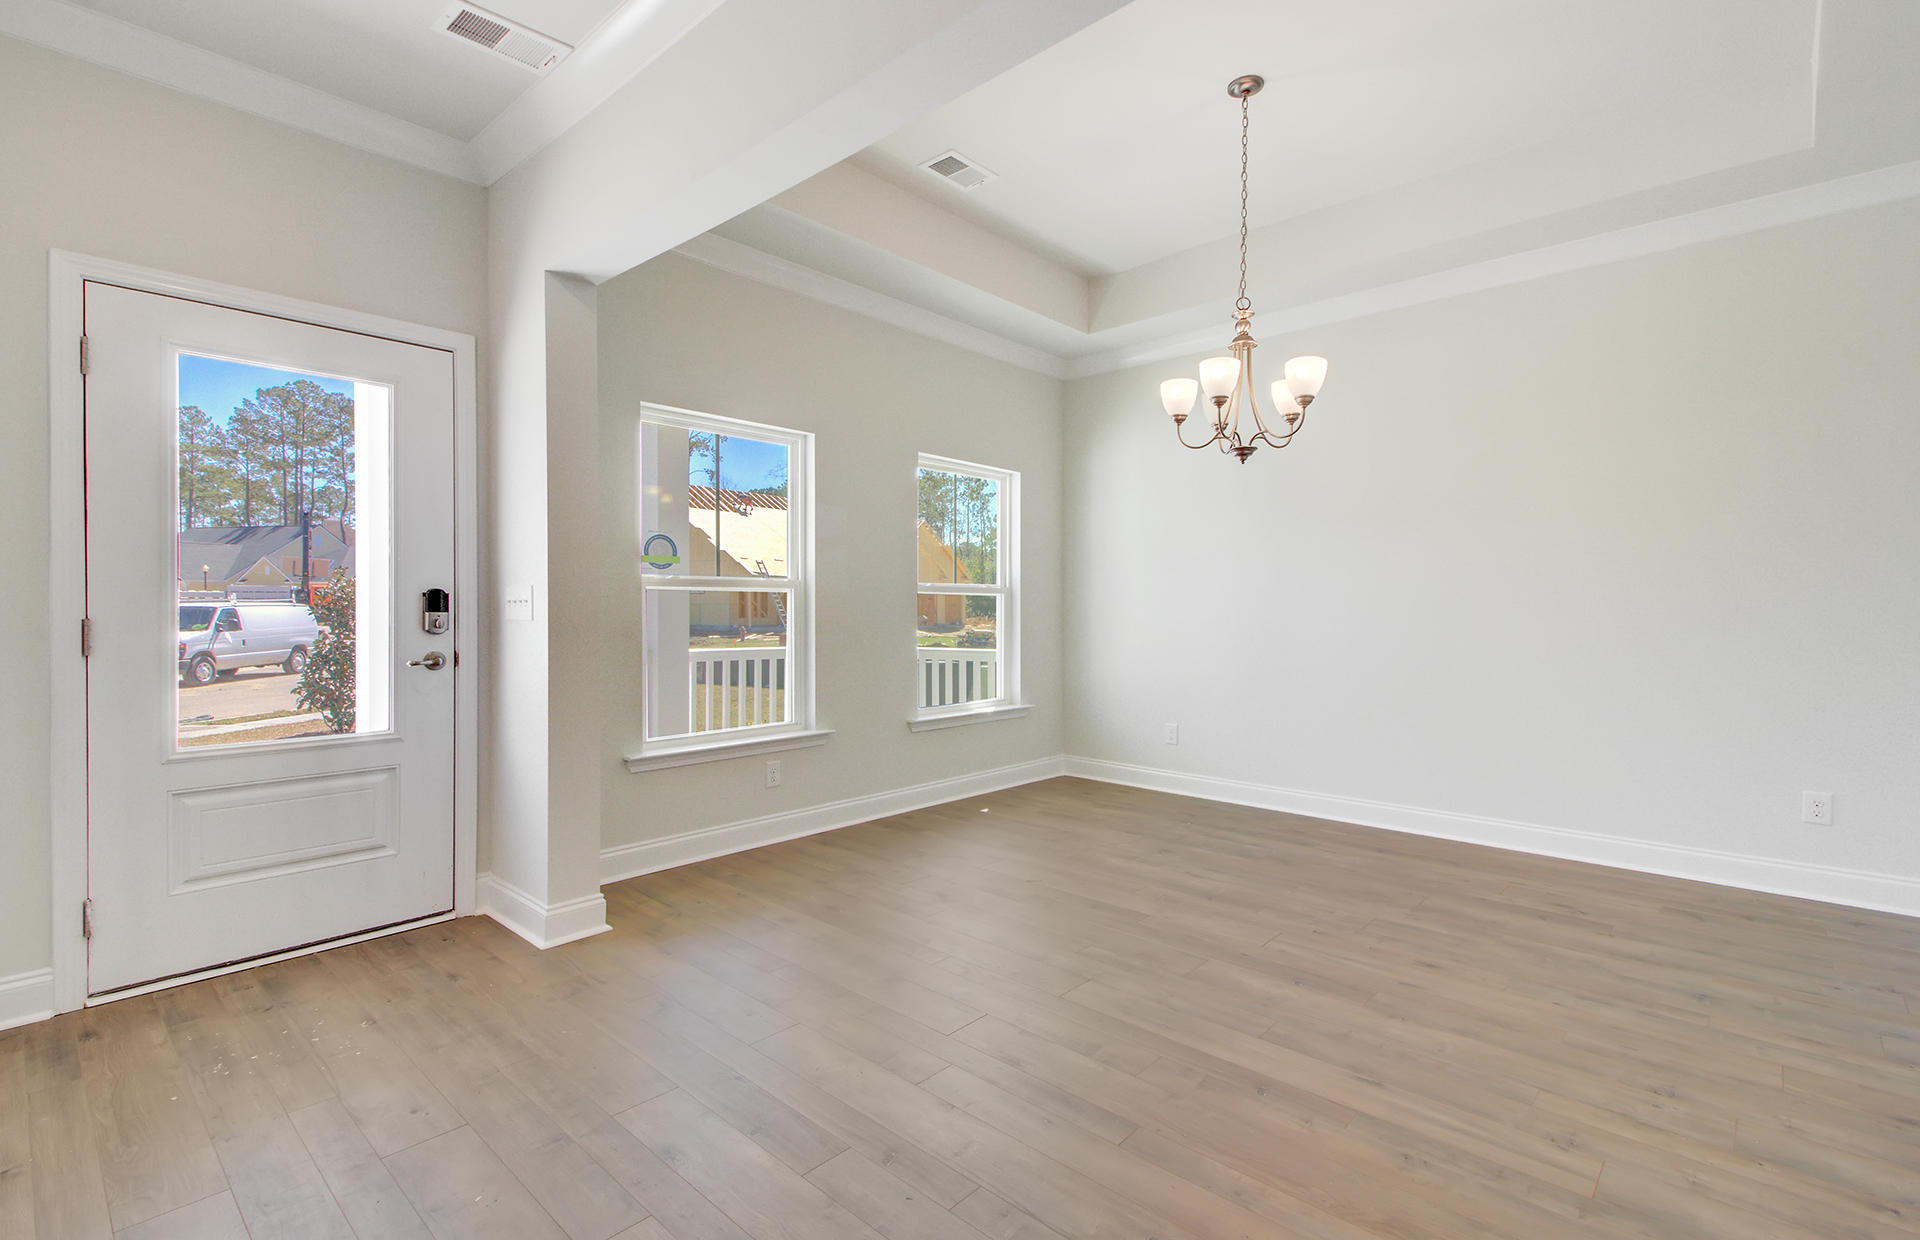 Park West Homes For Sale - 3062 Rice Field, Mount Pleasant, SC - 24